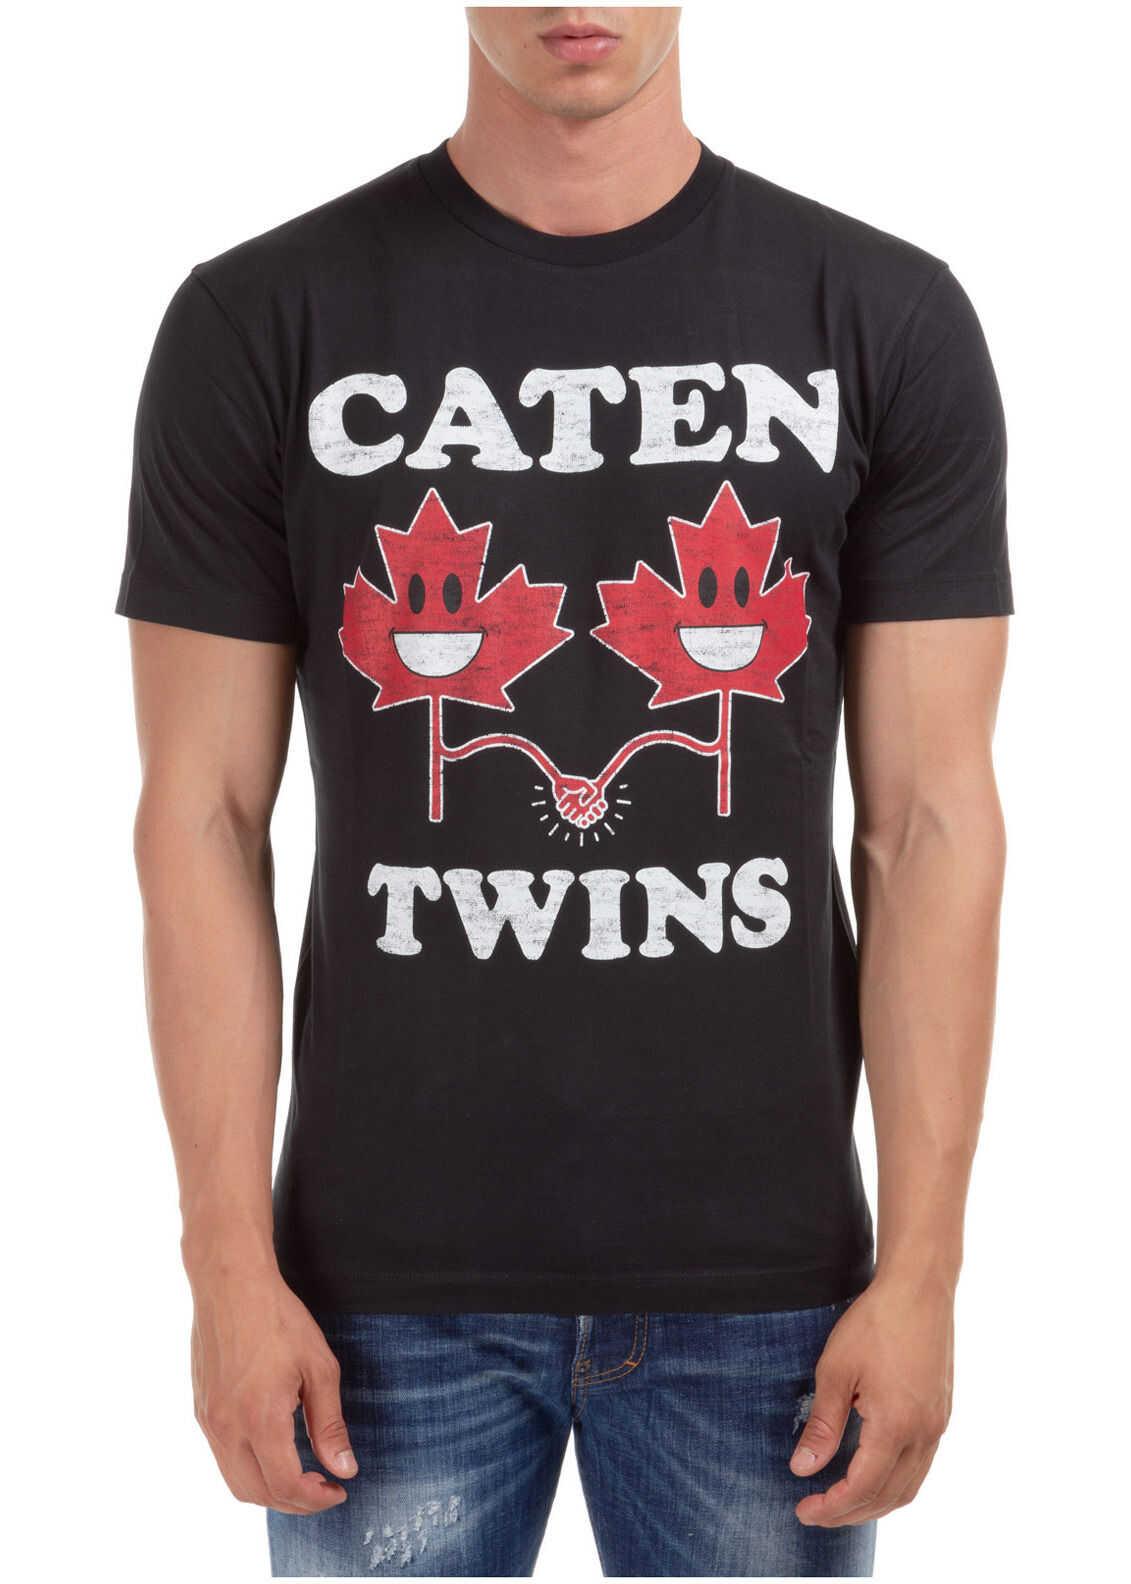 DSQUARED2 Short Sleeve T-Shirt Crew Neckline Jumper Caten'twins Black imagine